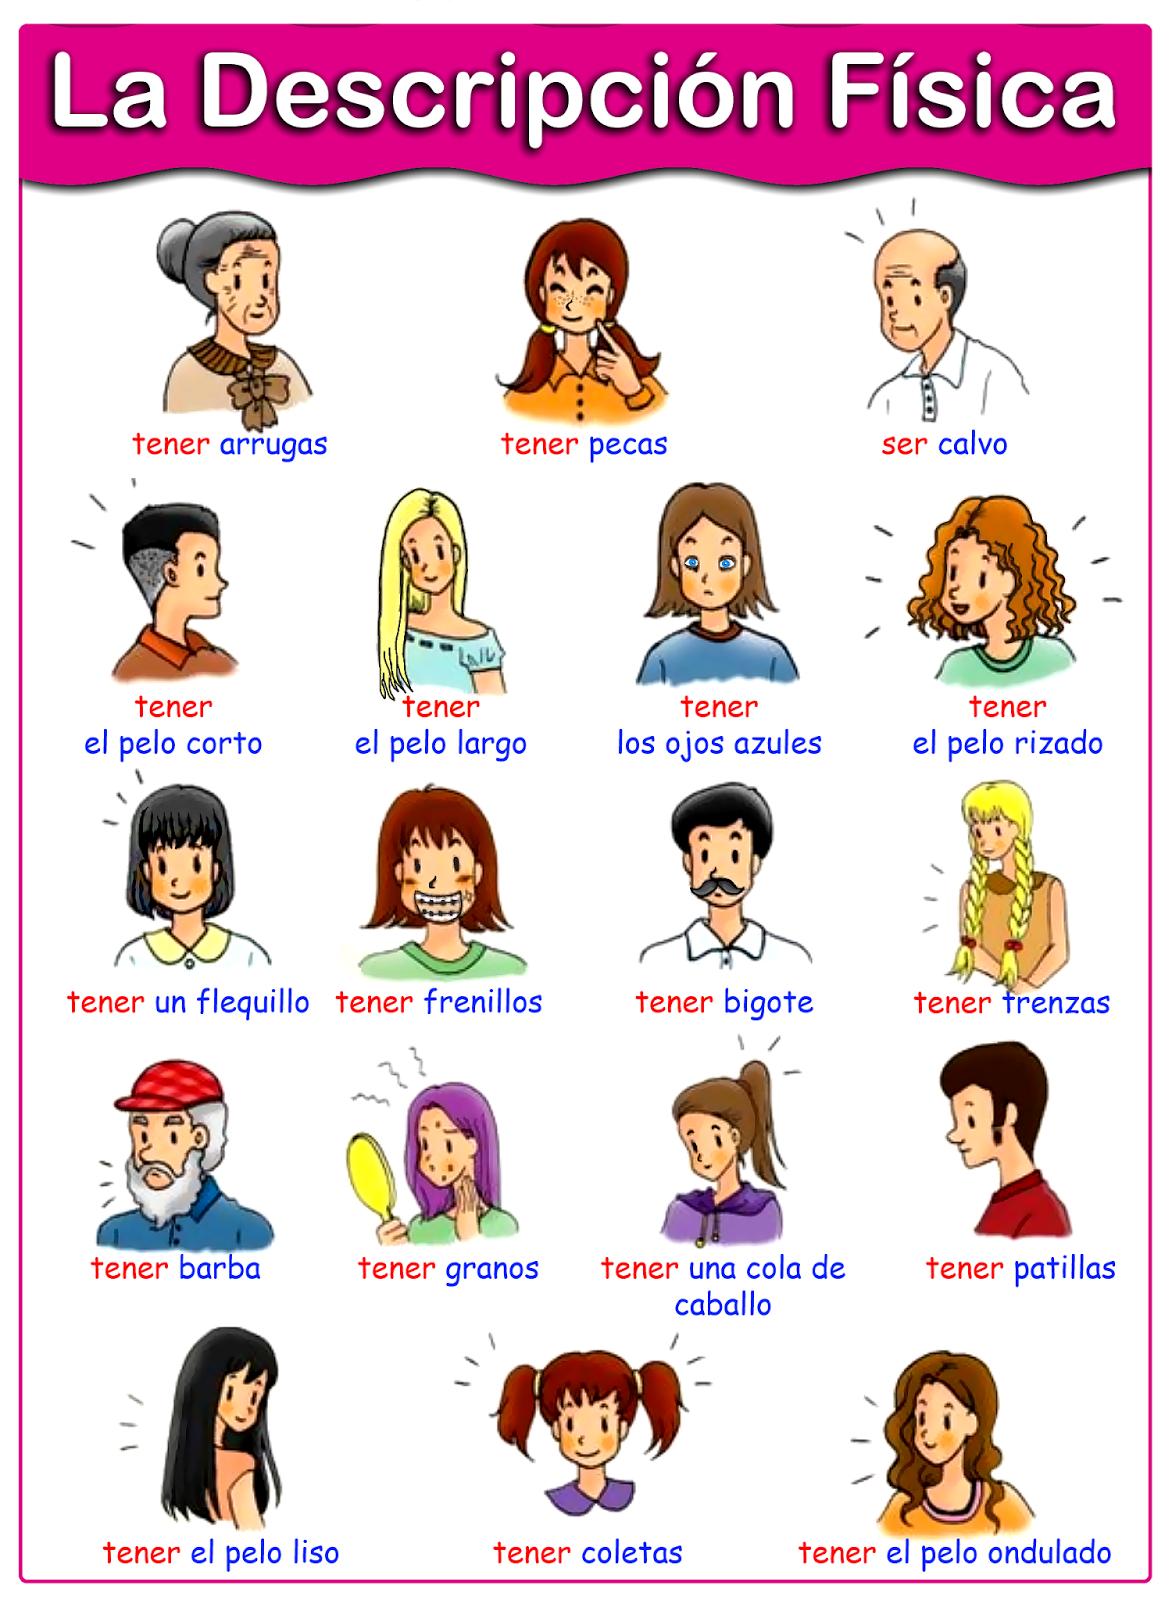 Guide of Enterprise Terms and Descriptions